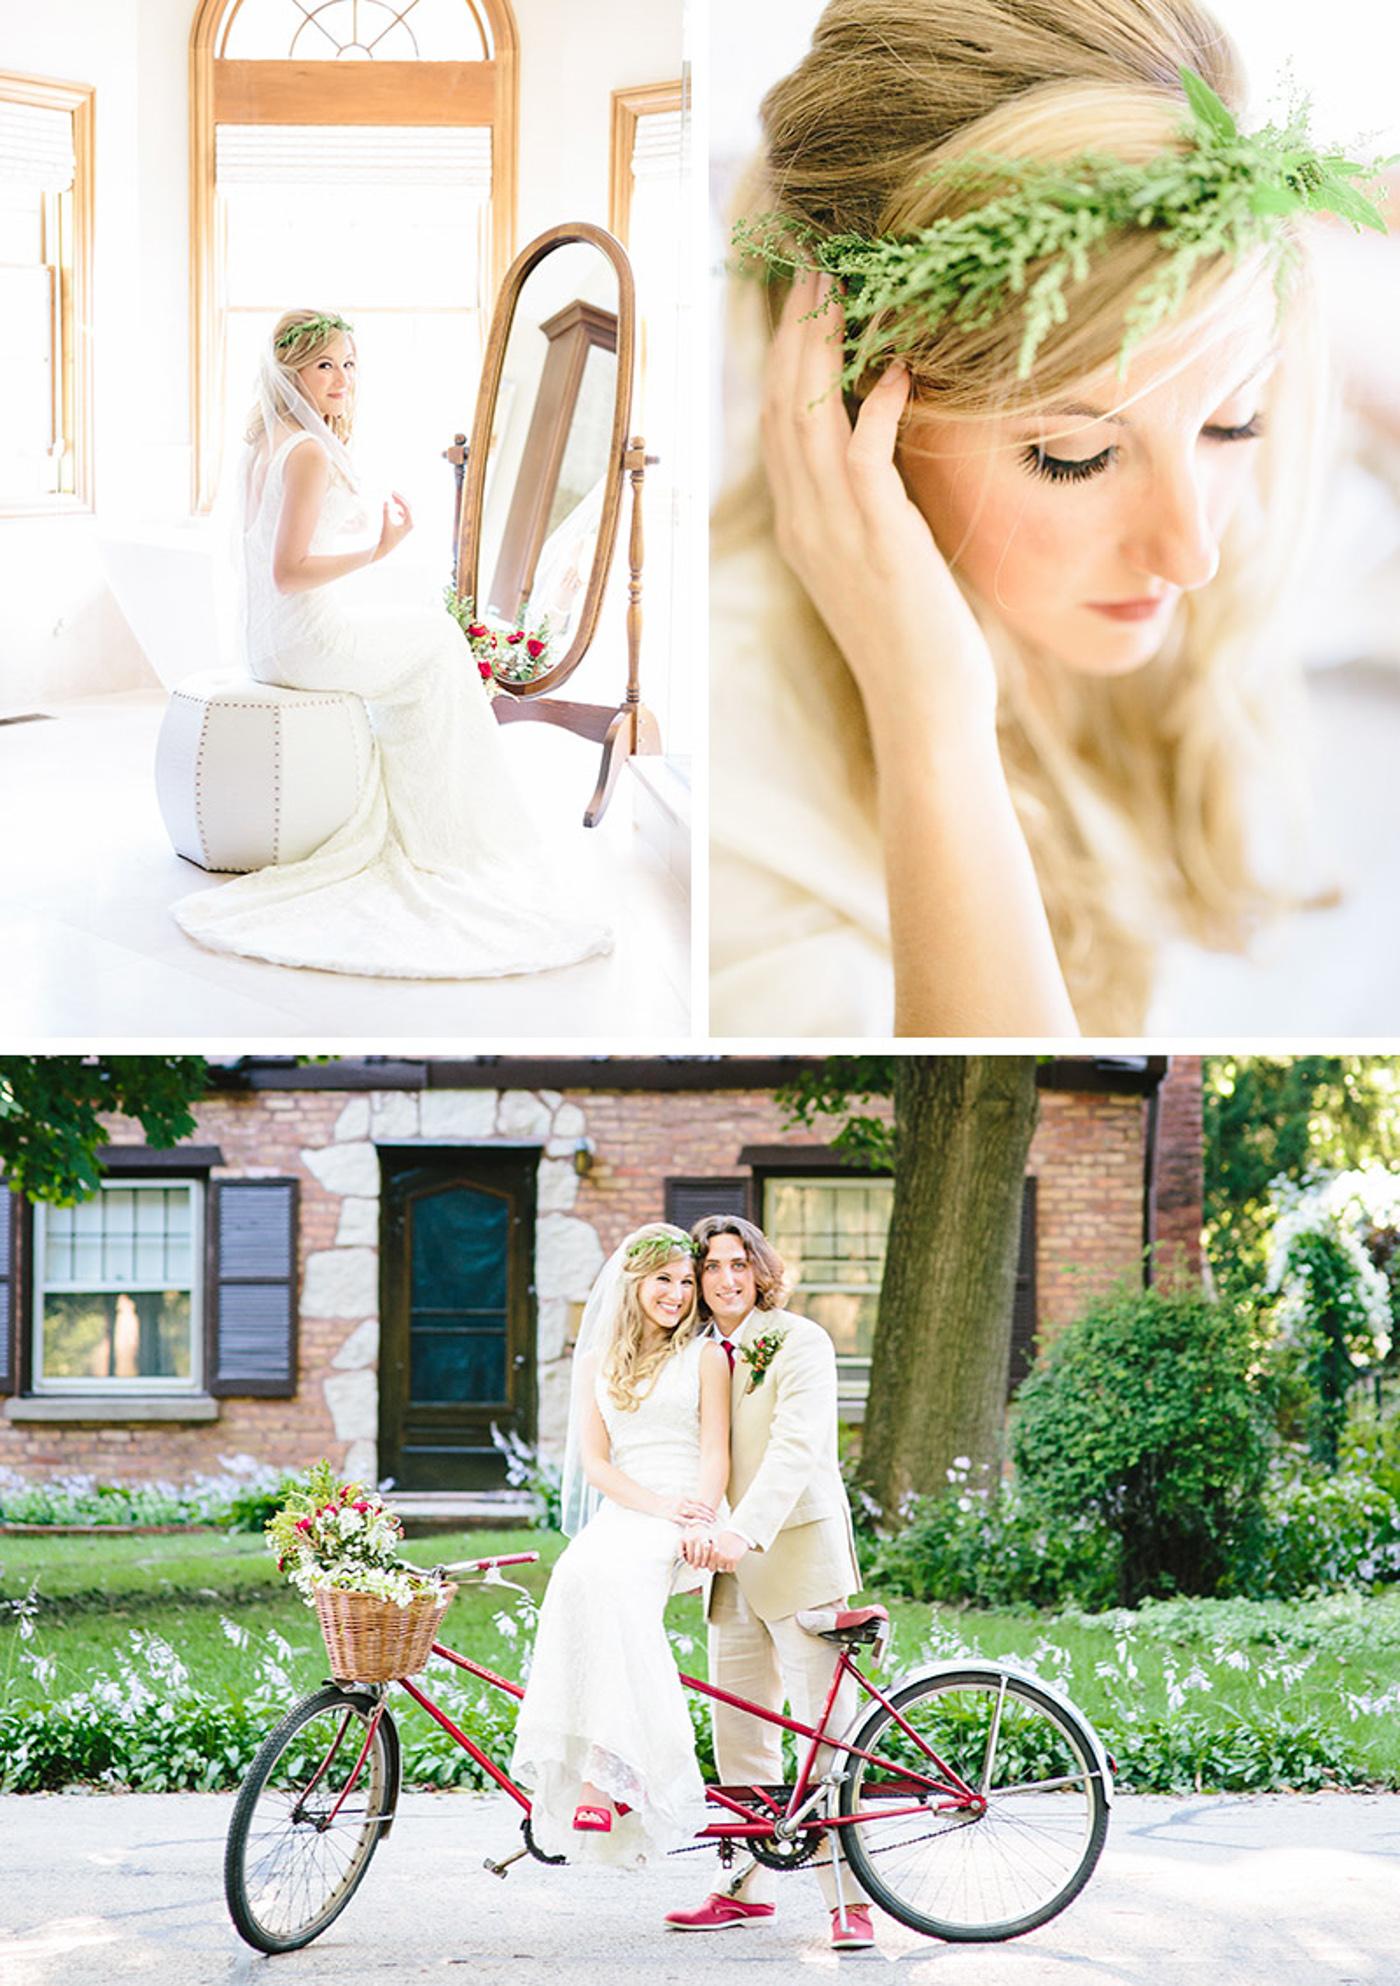 Chicago_Fine_Art_Wedding_Photography_nenn.jpg